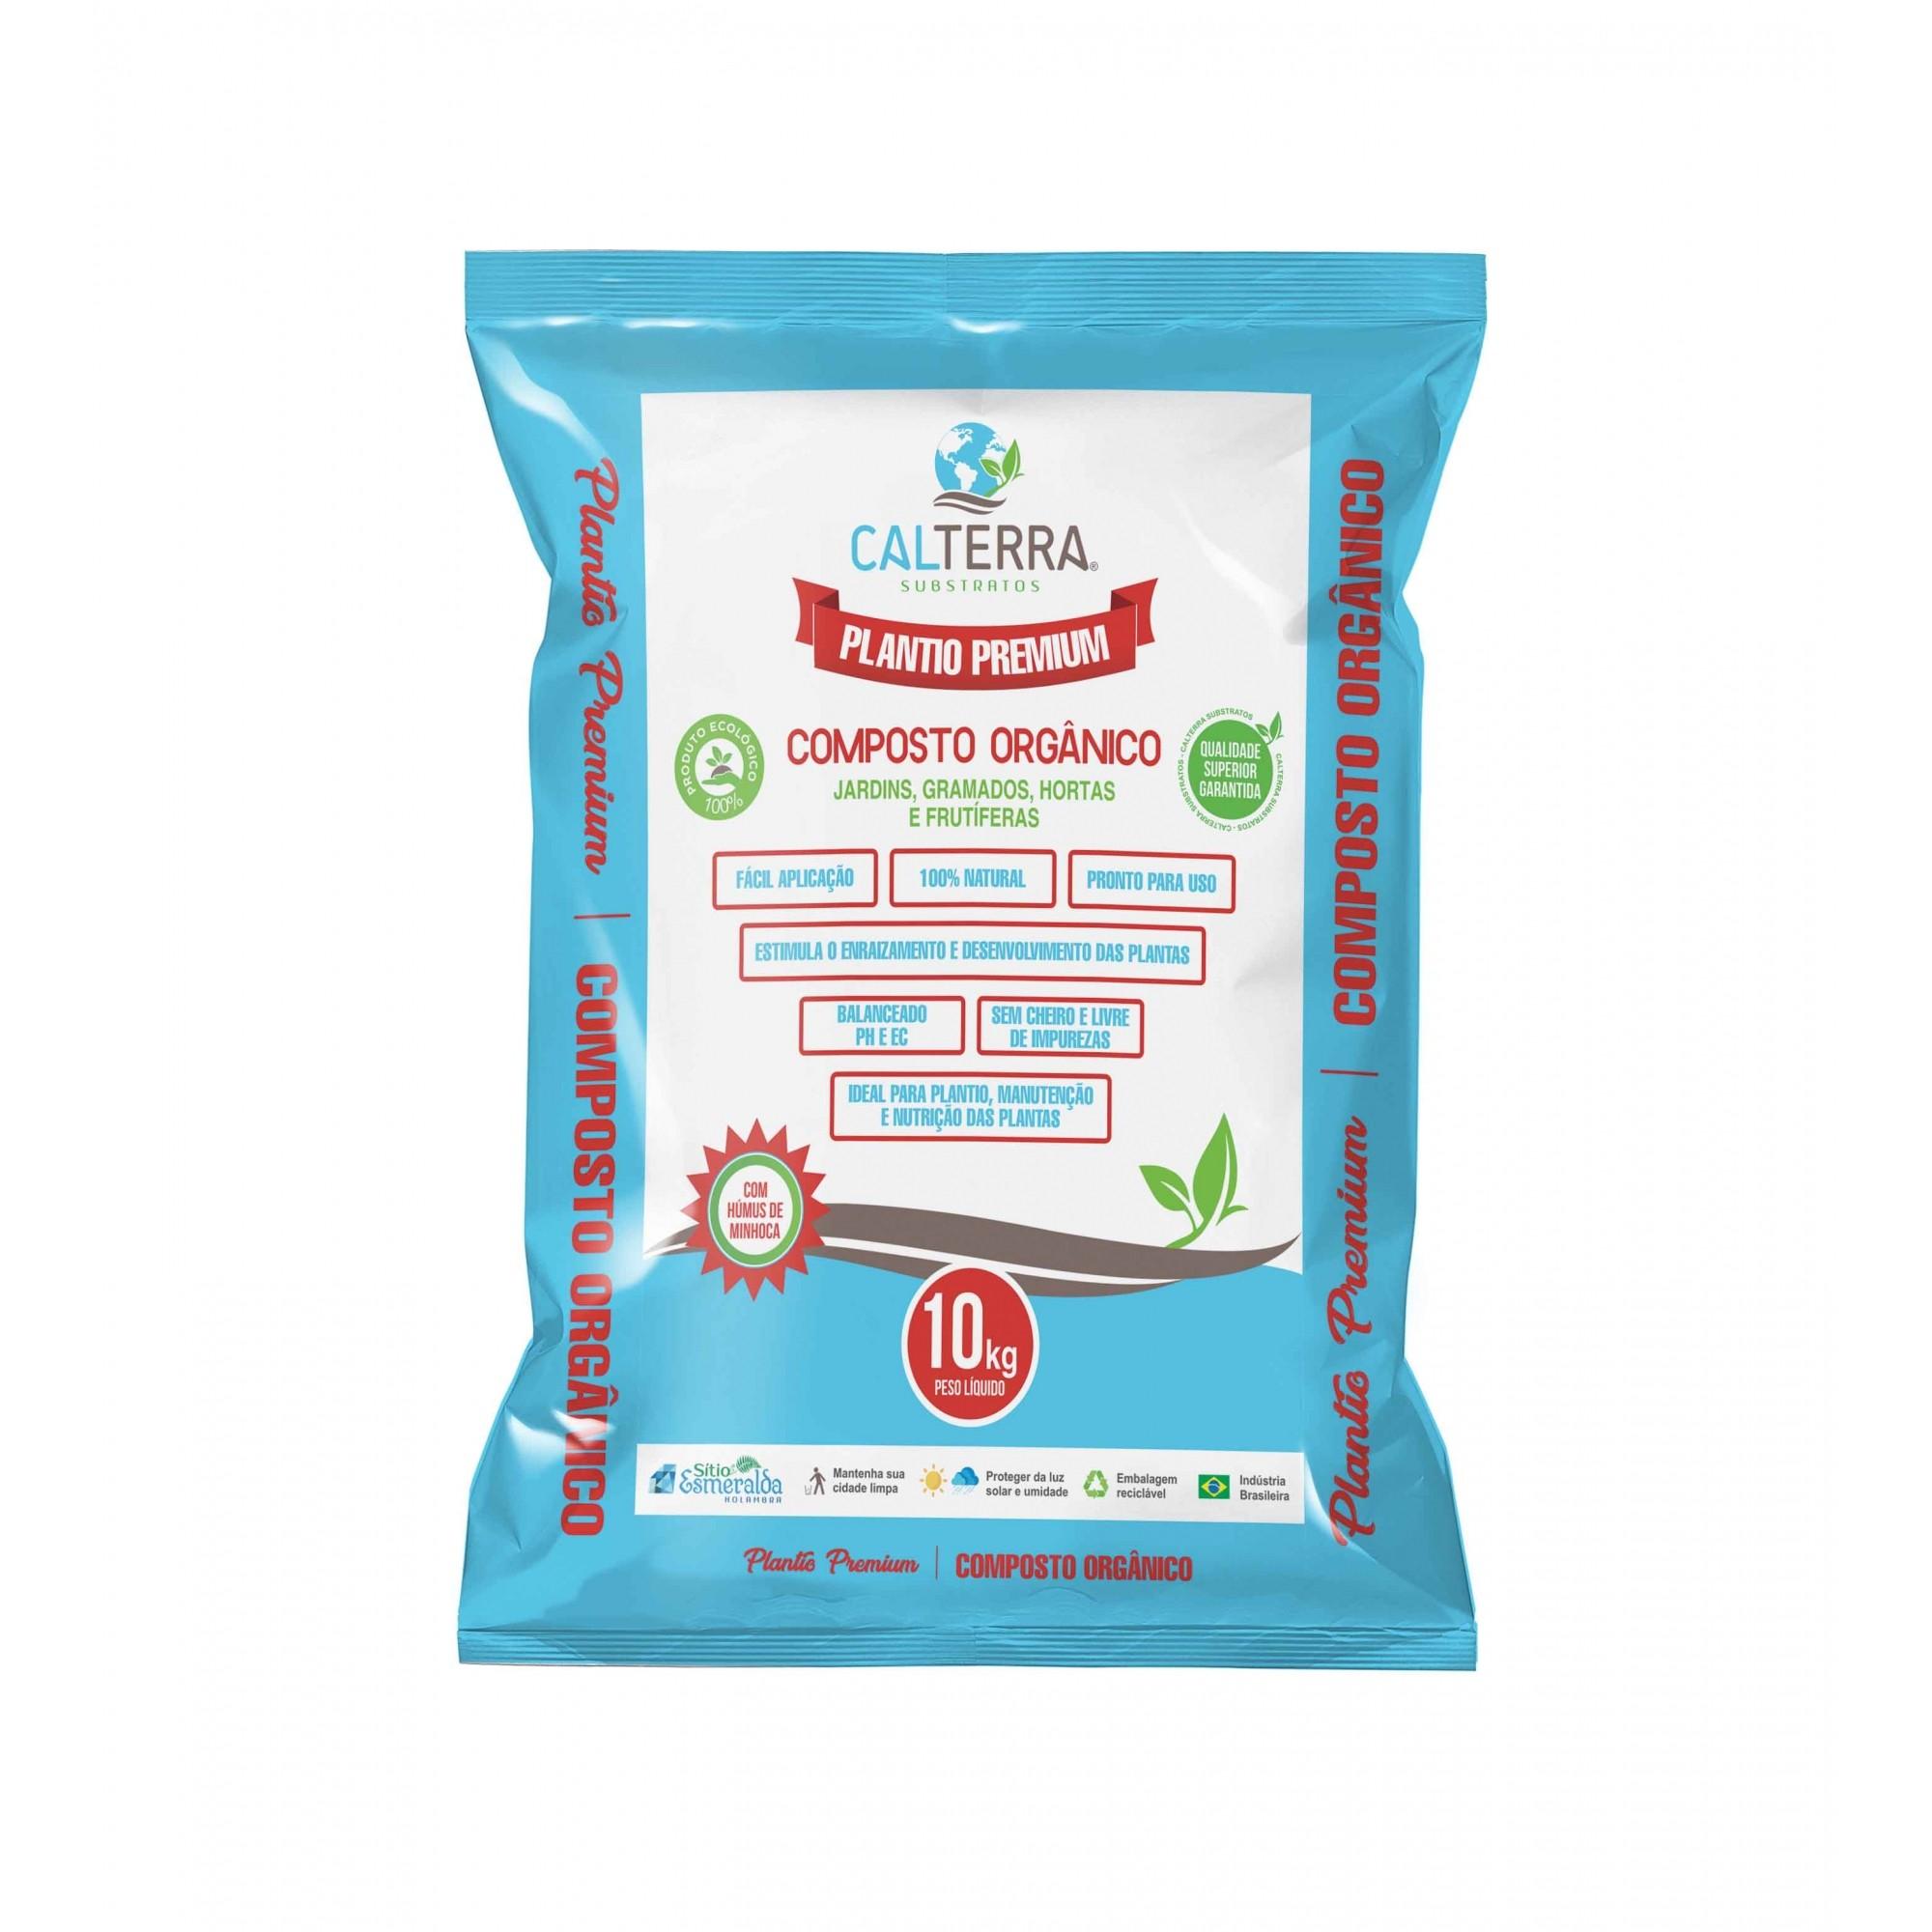 Substrato Plantio Premium Composto Orgânico 10kg Calterra